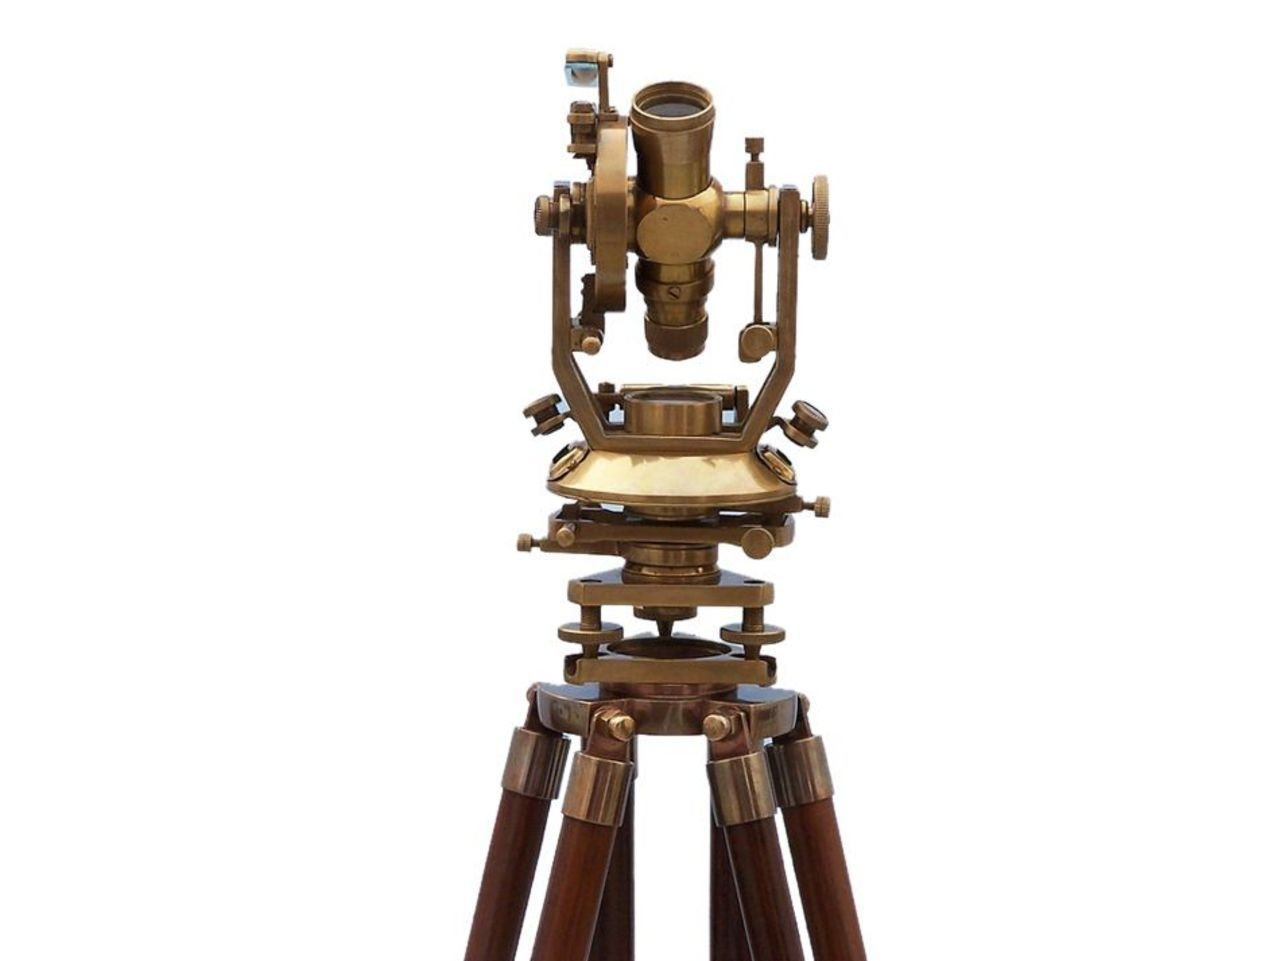 Hampton Nautical  Floor Standing Theodolite Leveling Instruments Instrument, 62'', Brass